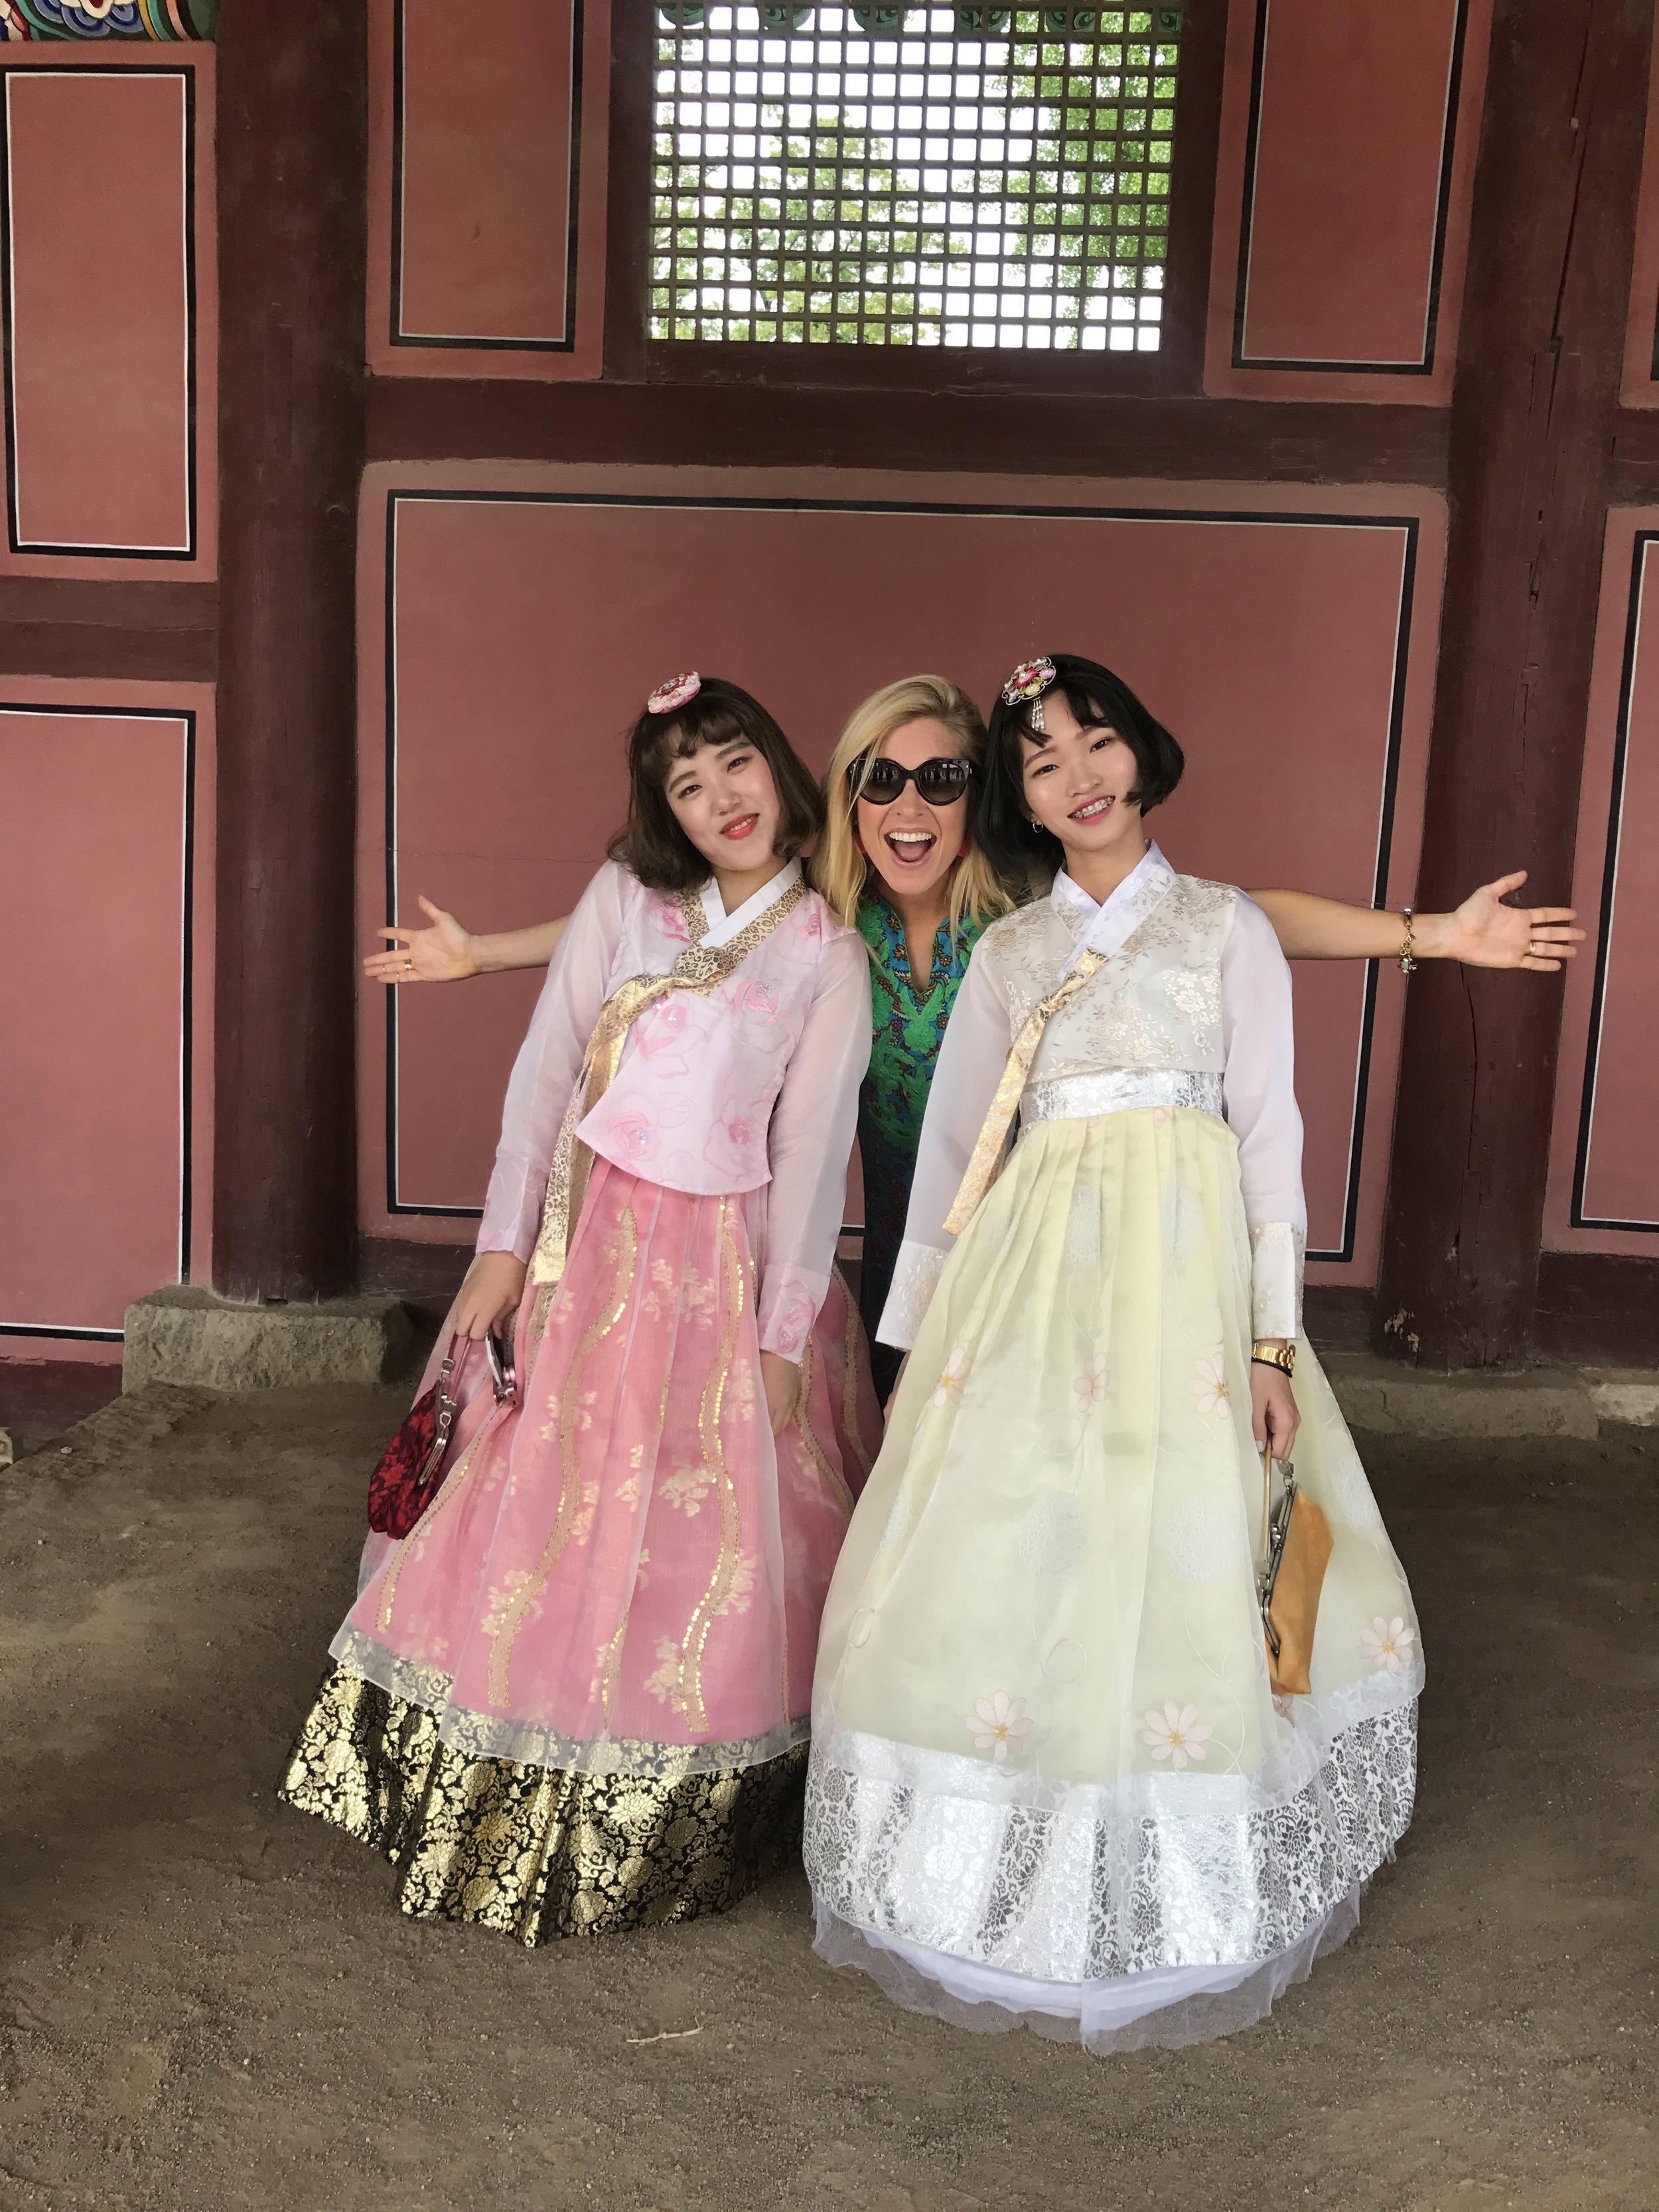 Anna Kooiman Seoul South Korea Fitness Travel Lifestyle Fashion Television Adventure AnnaKooiman.com